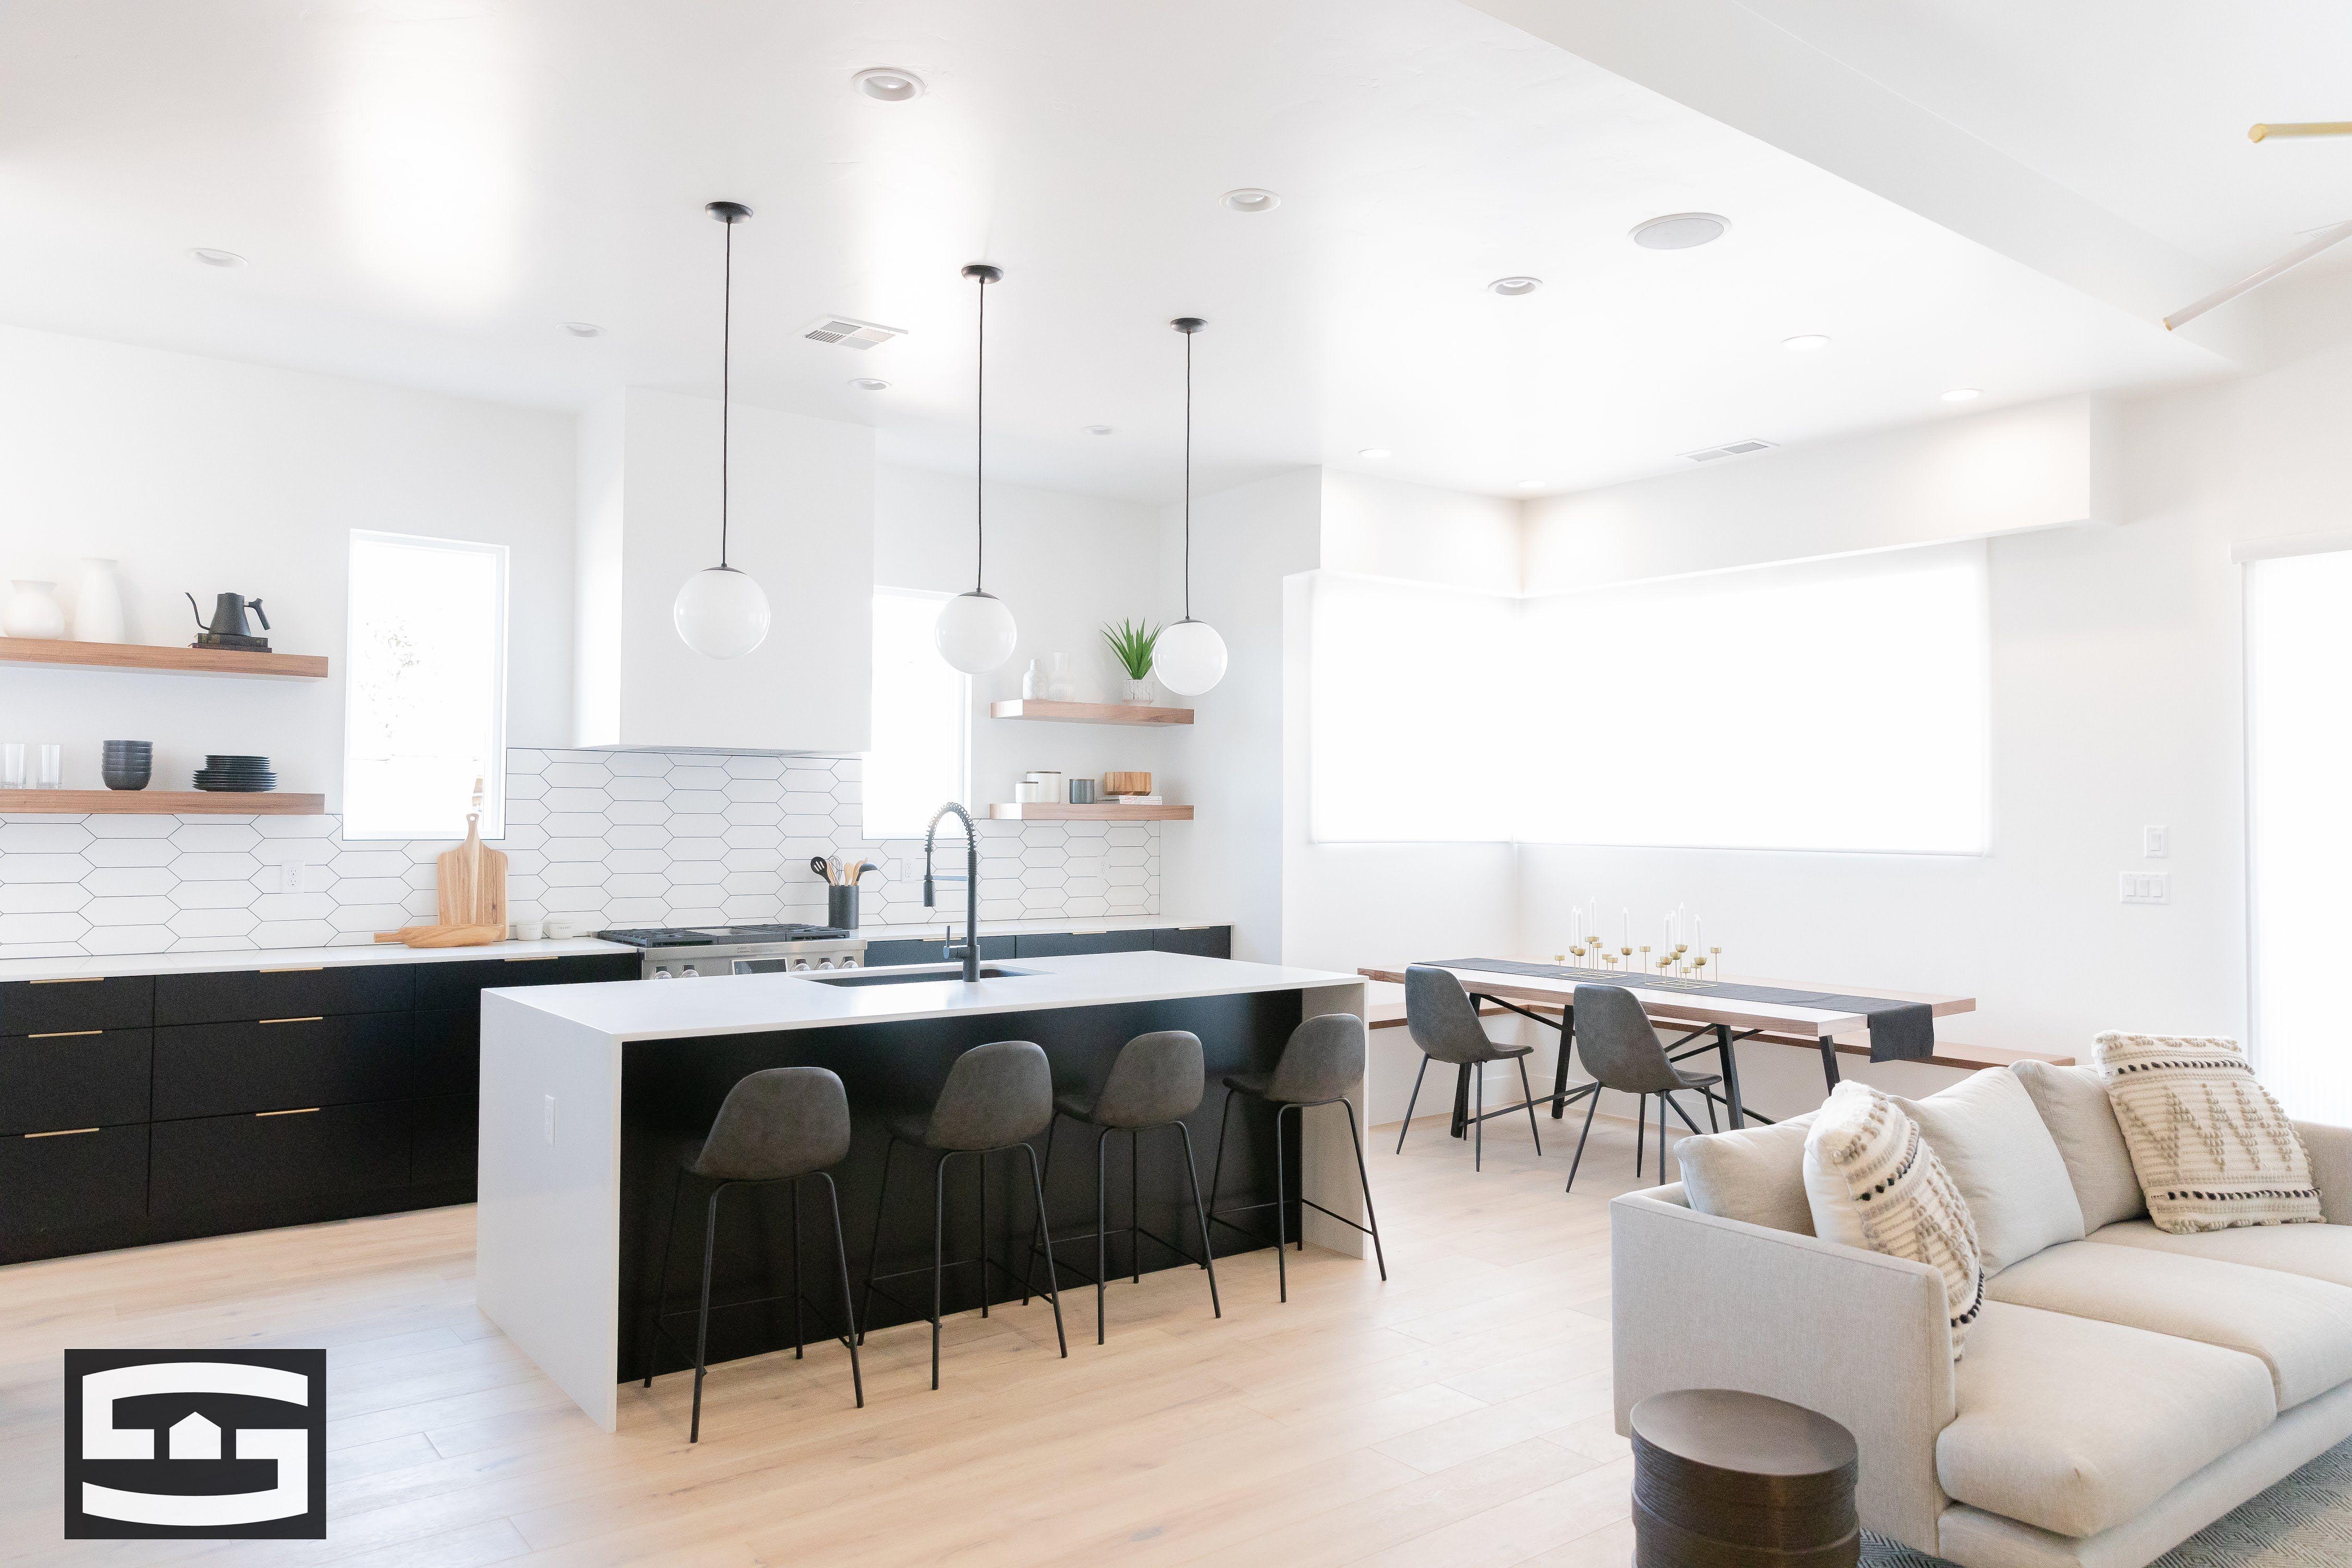 2019 St George Parade Of Homes 9 Desert Modern By Sullivan